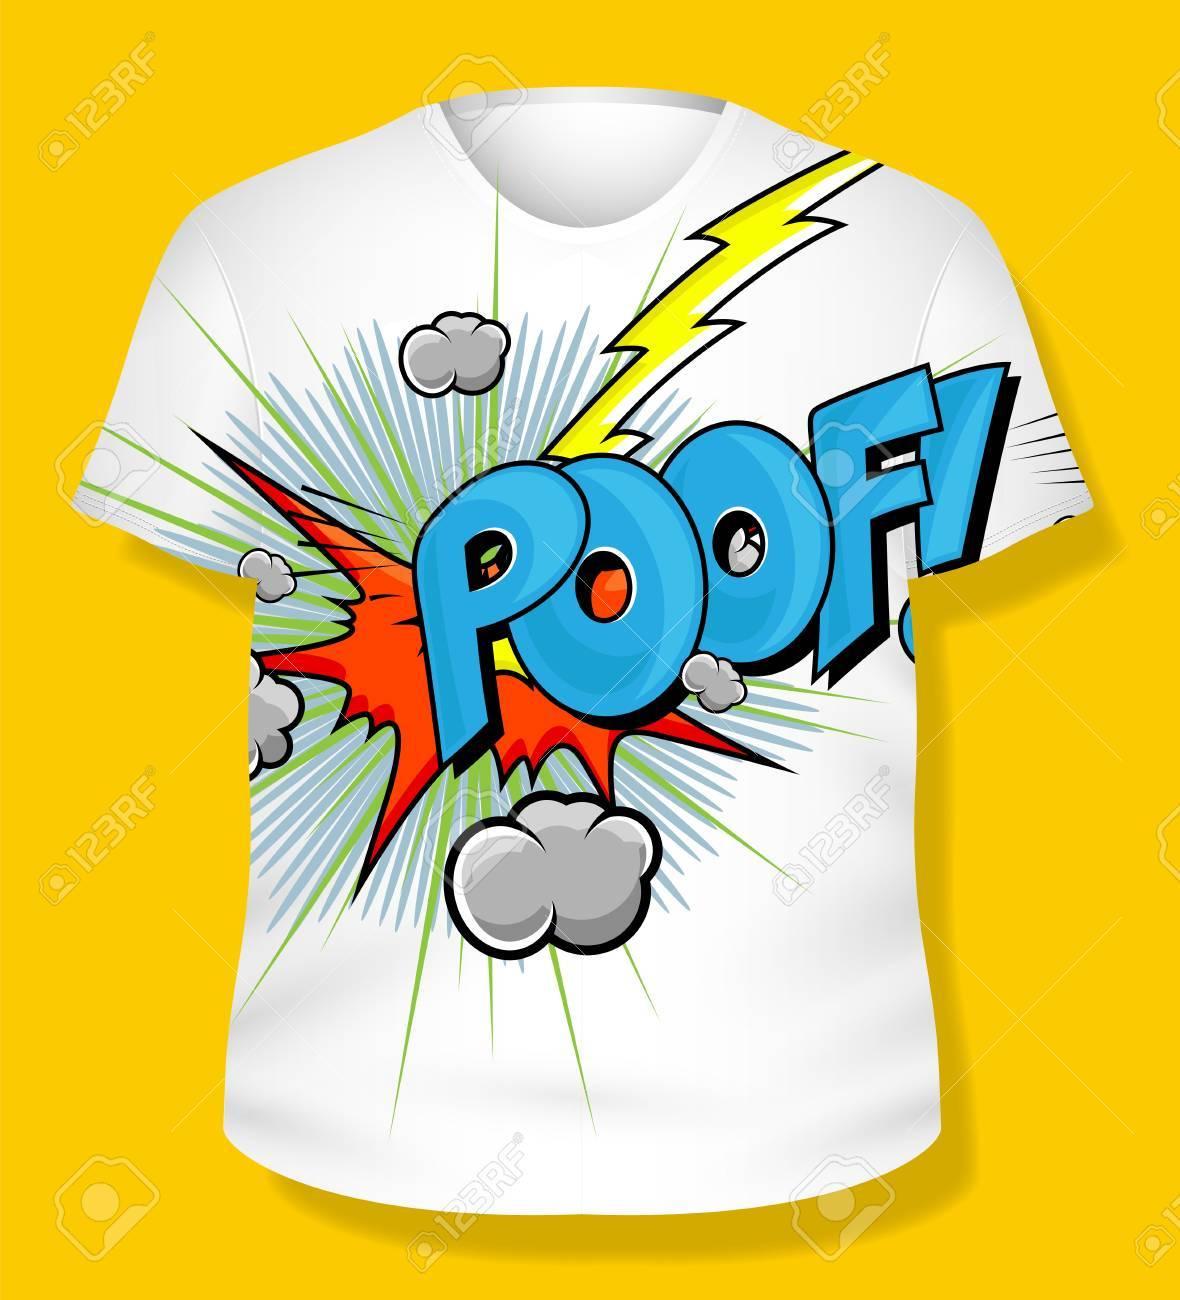 T-shirt Design Stock Vector - 19419795